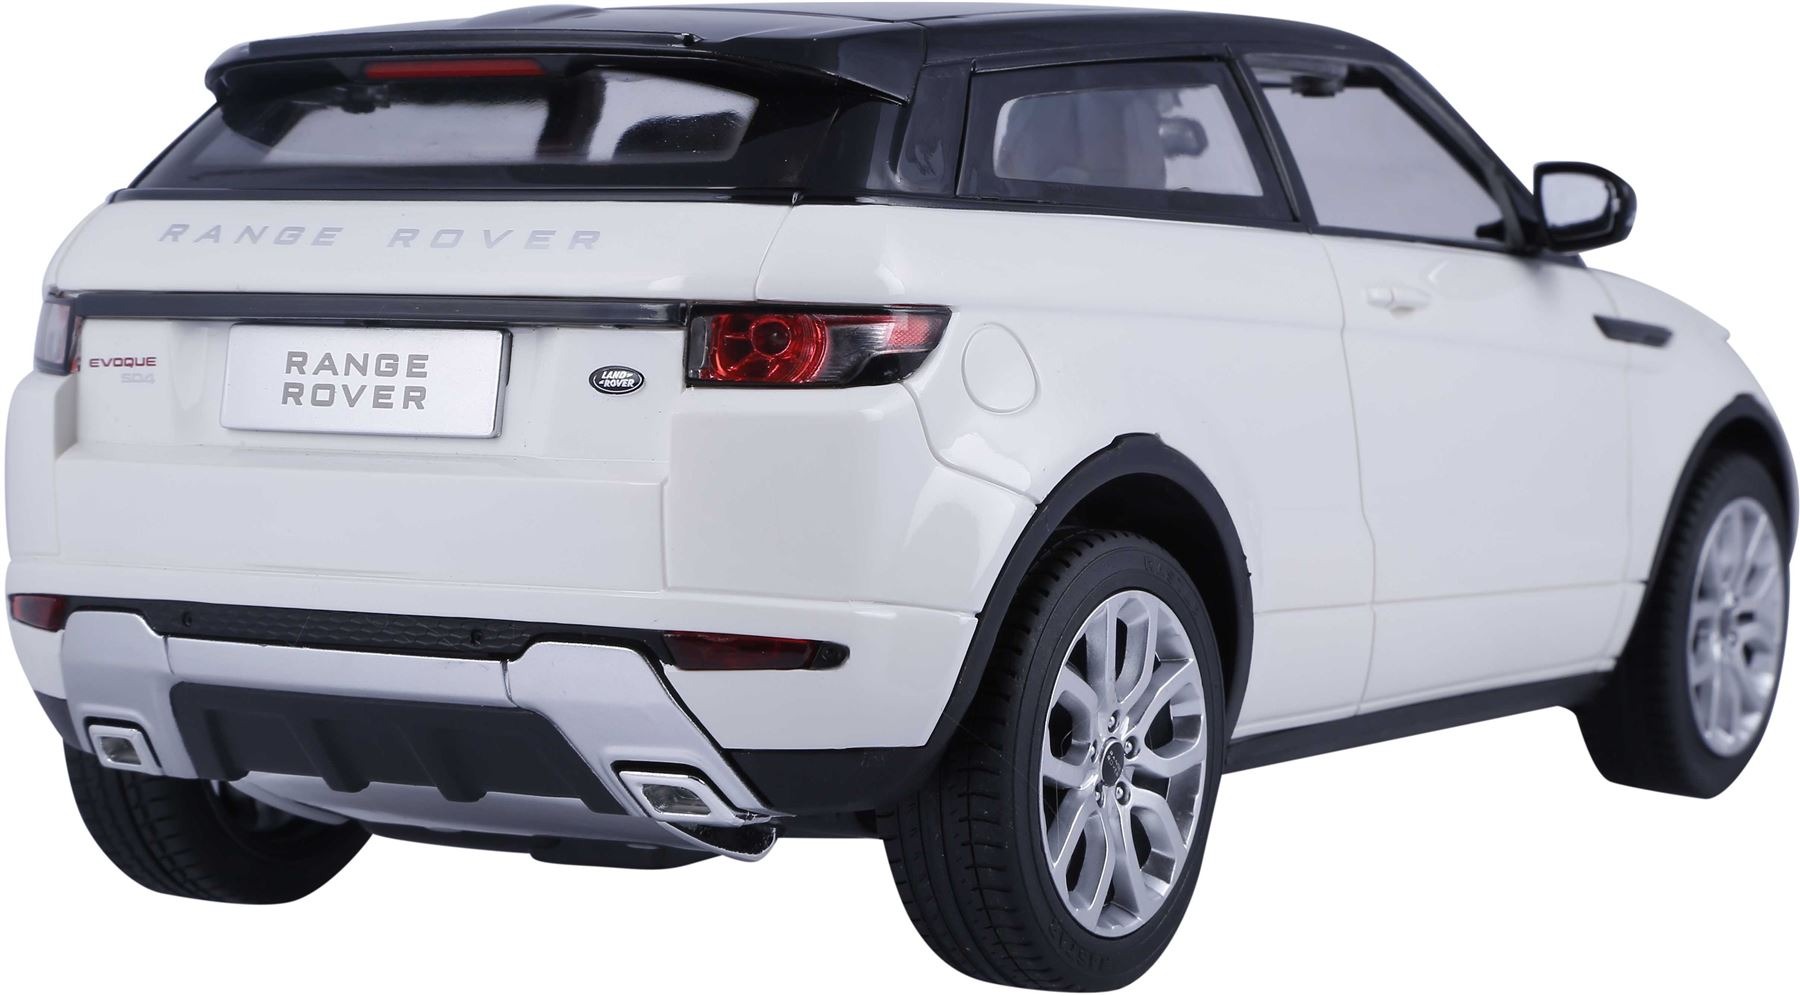 official licensed rc range rover evoque car remote control. Black Bedroom Furniture Sets. Home Design Ideas